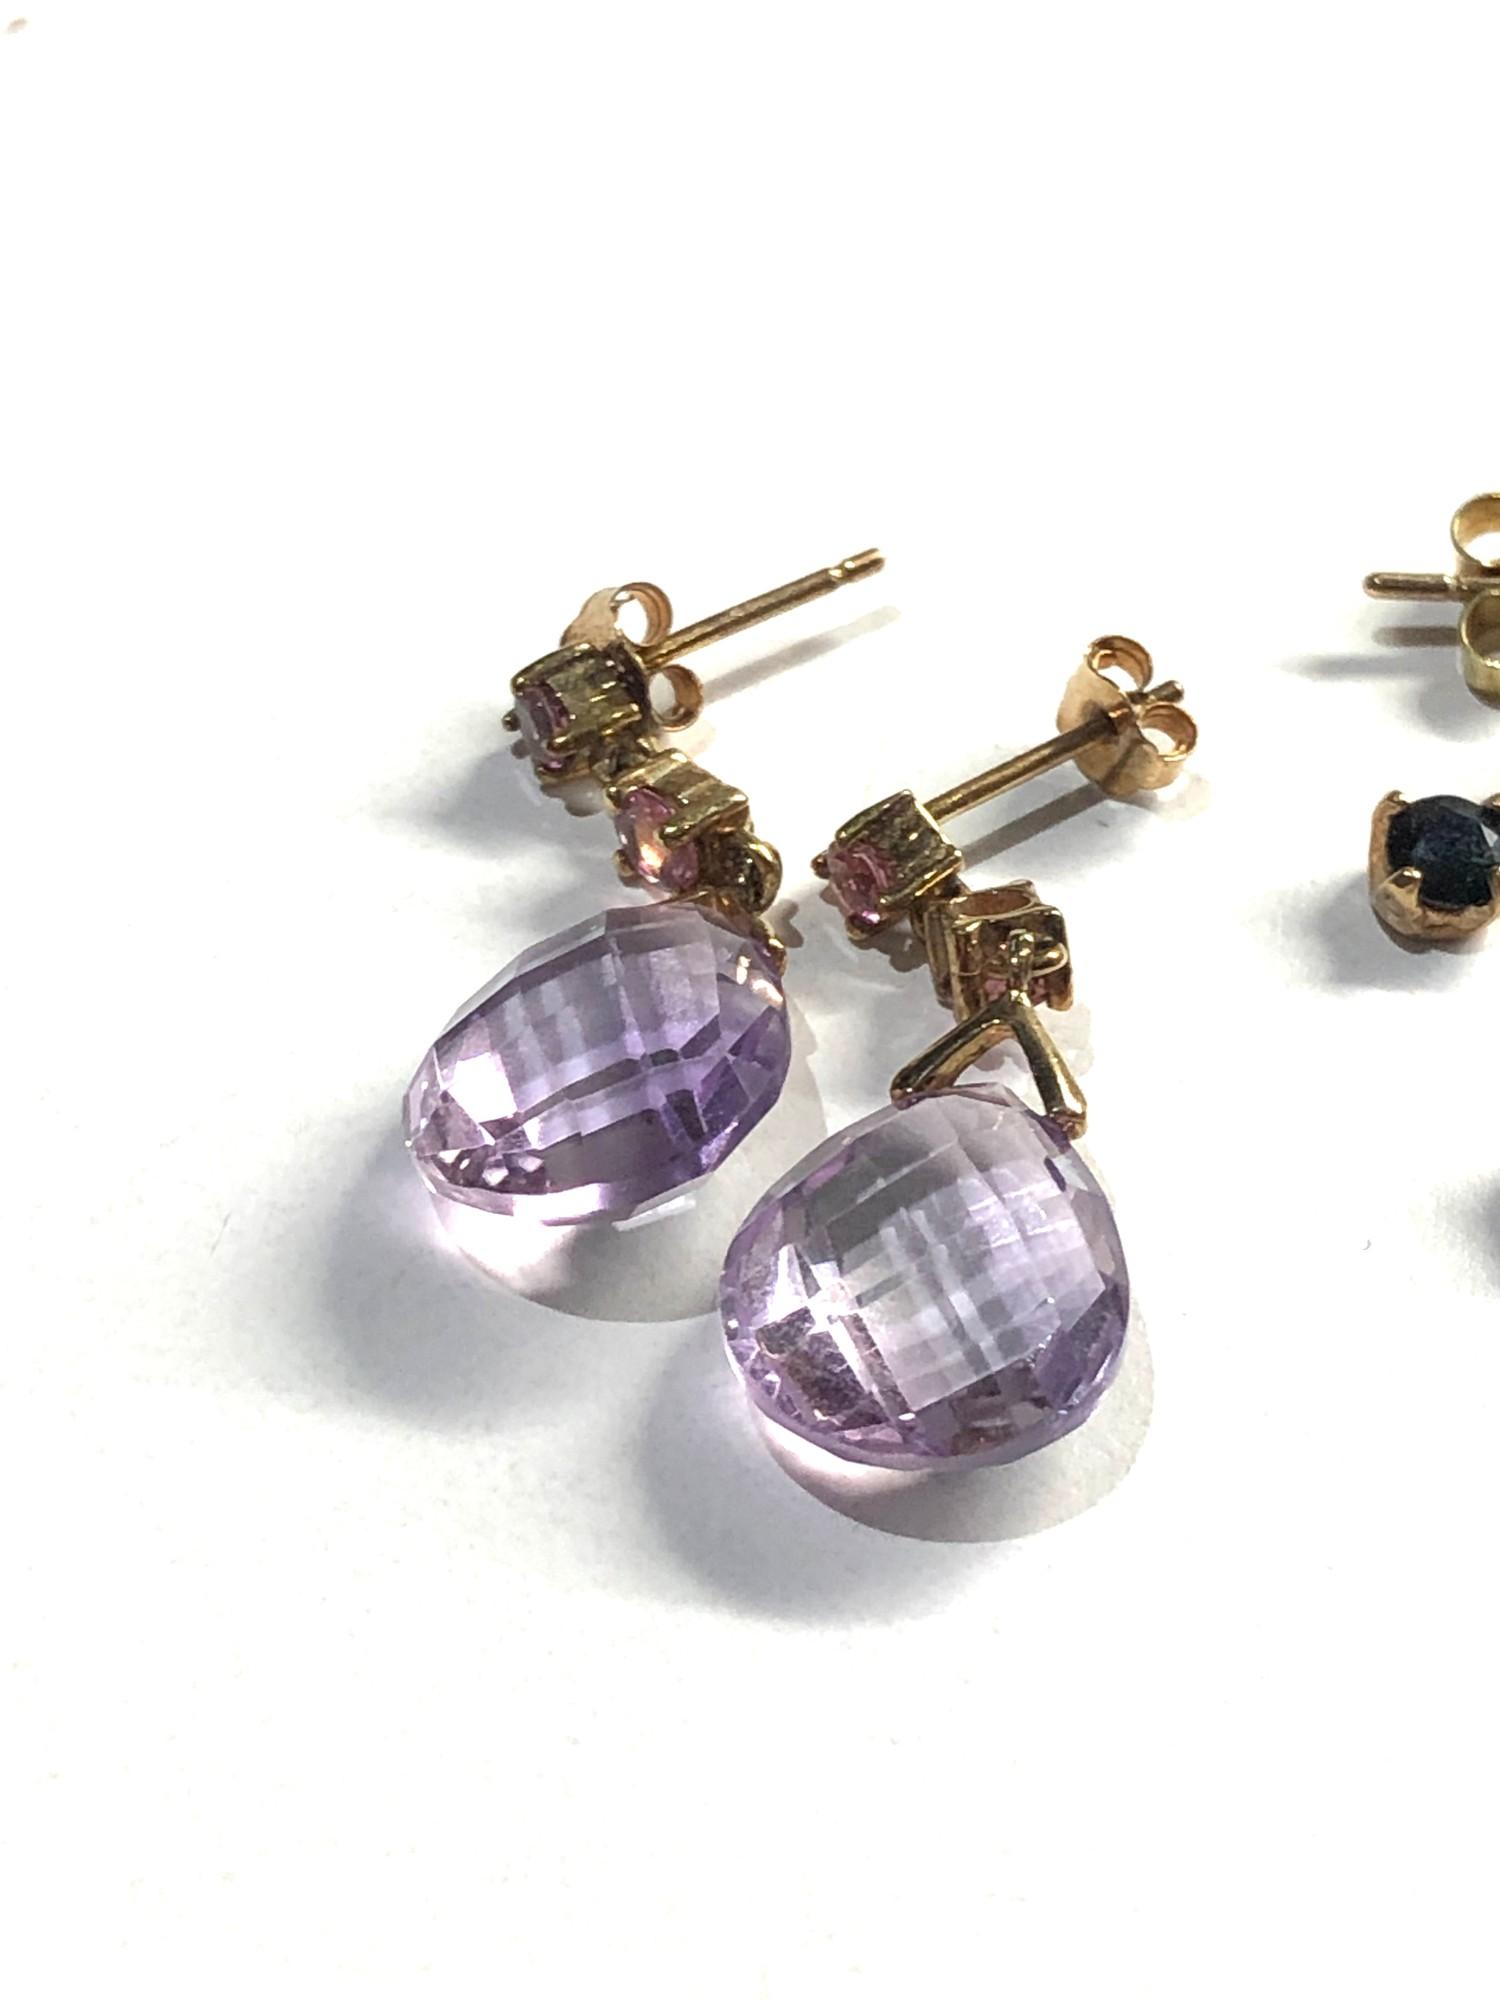 3 x 9ct Gold earrings inc. diamond studs, drops 4.5g - Image 2 of 3